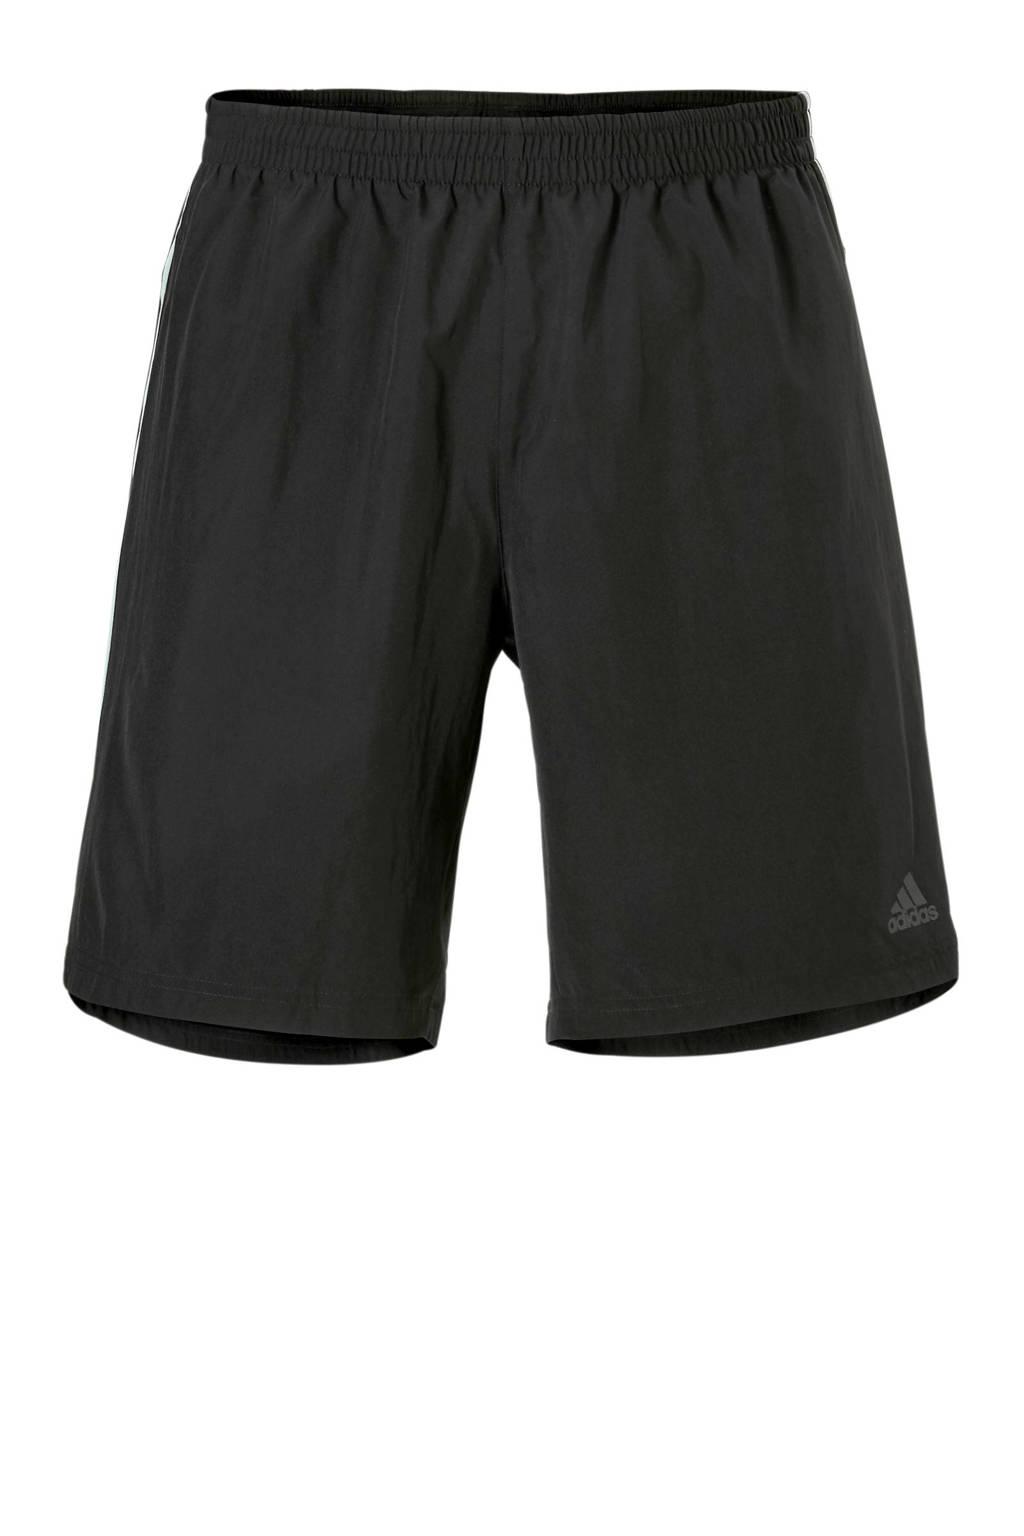 adidas performance   hardloopshort zwart, Zwart